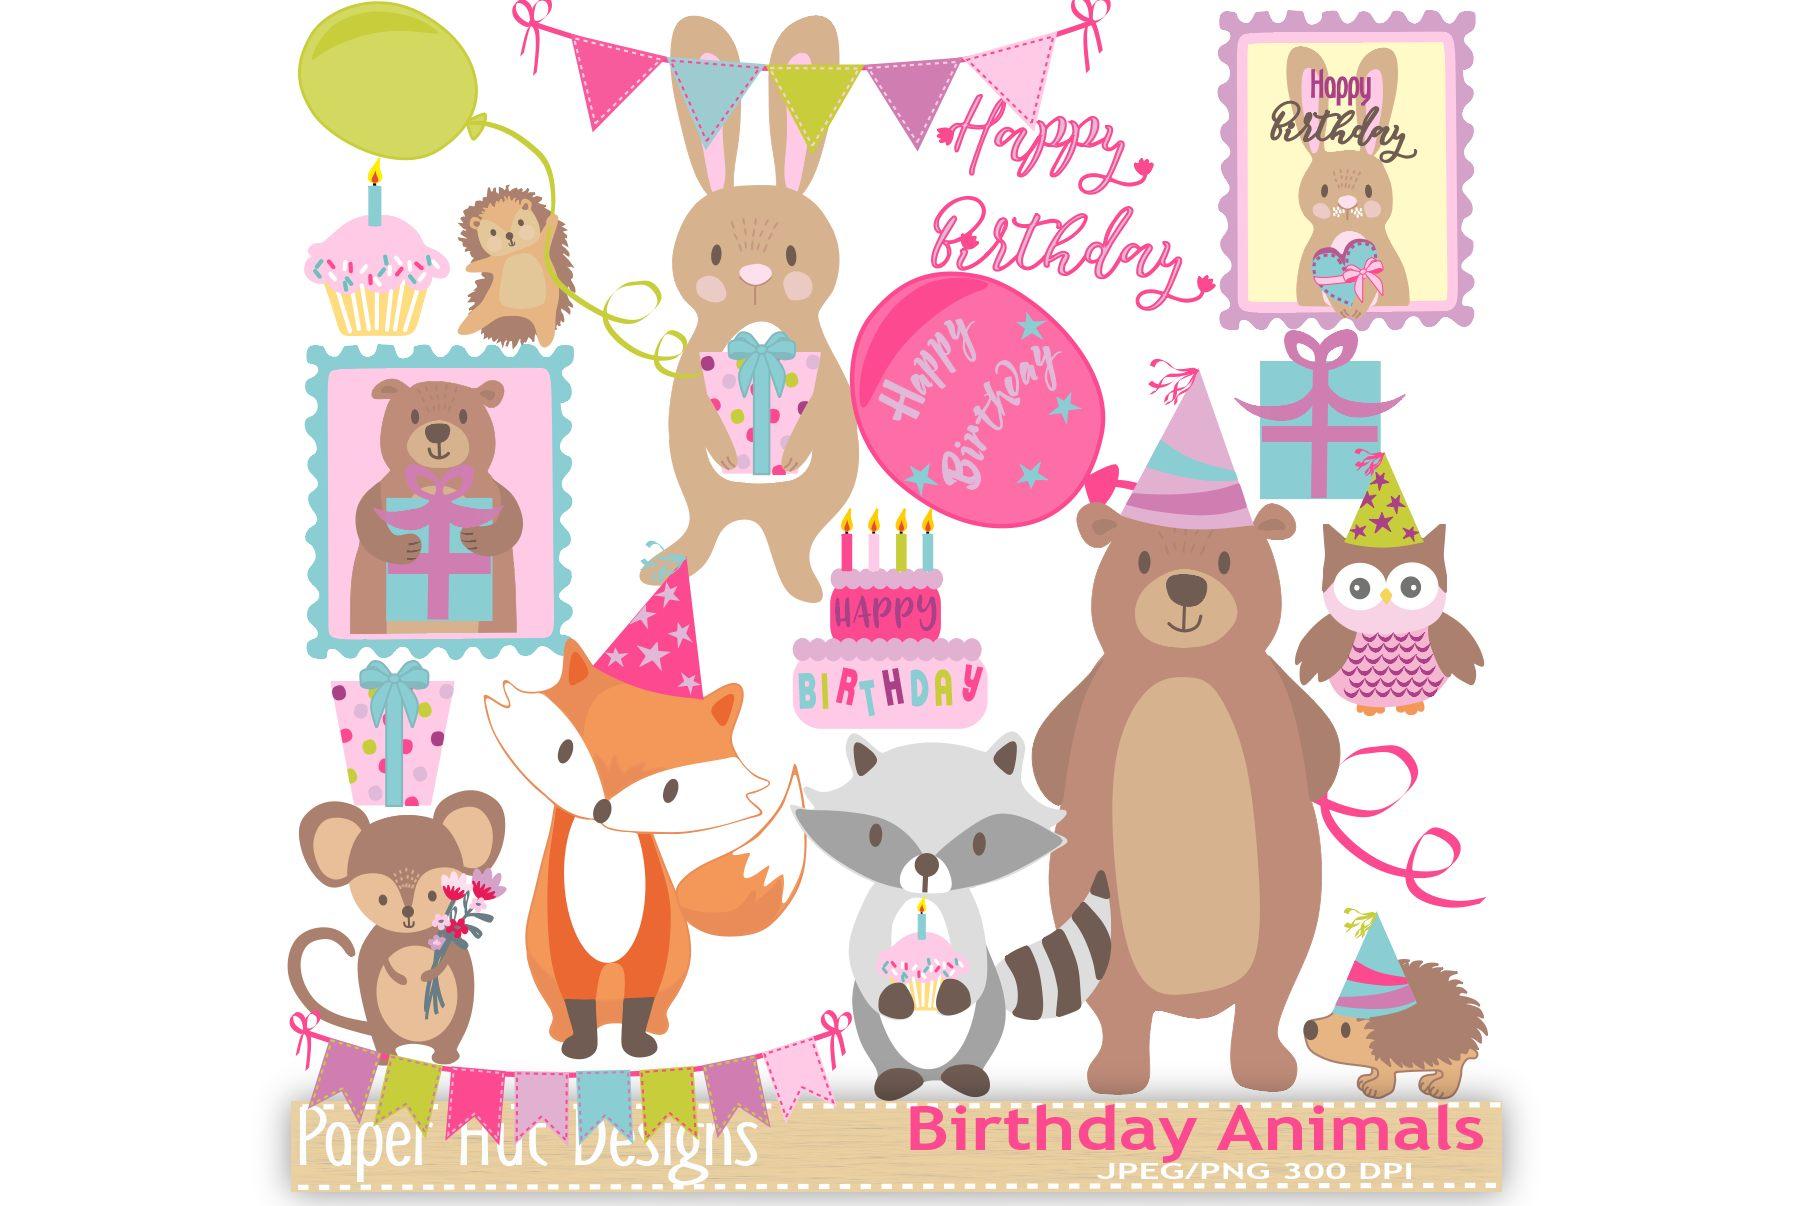 Birthday Animals Clipart example image 1